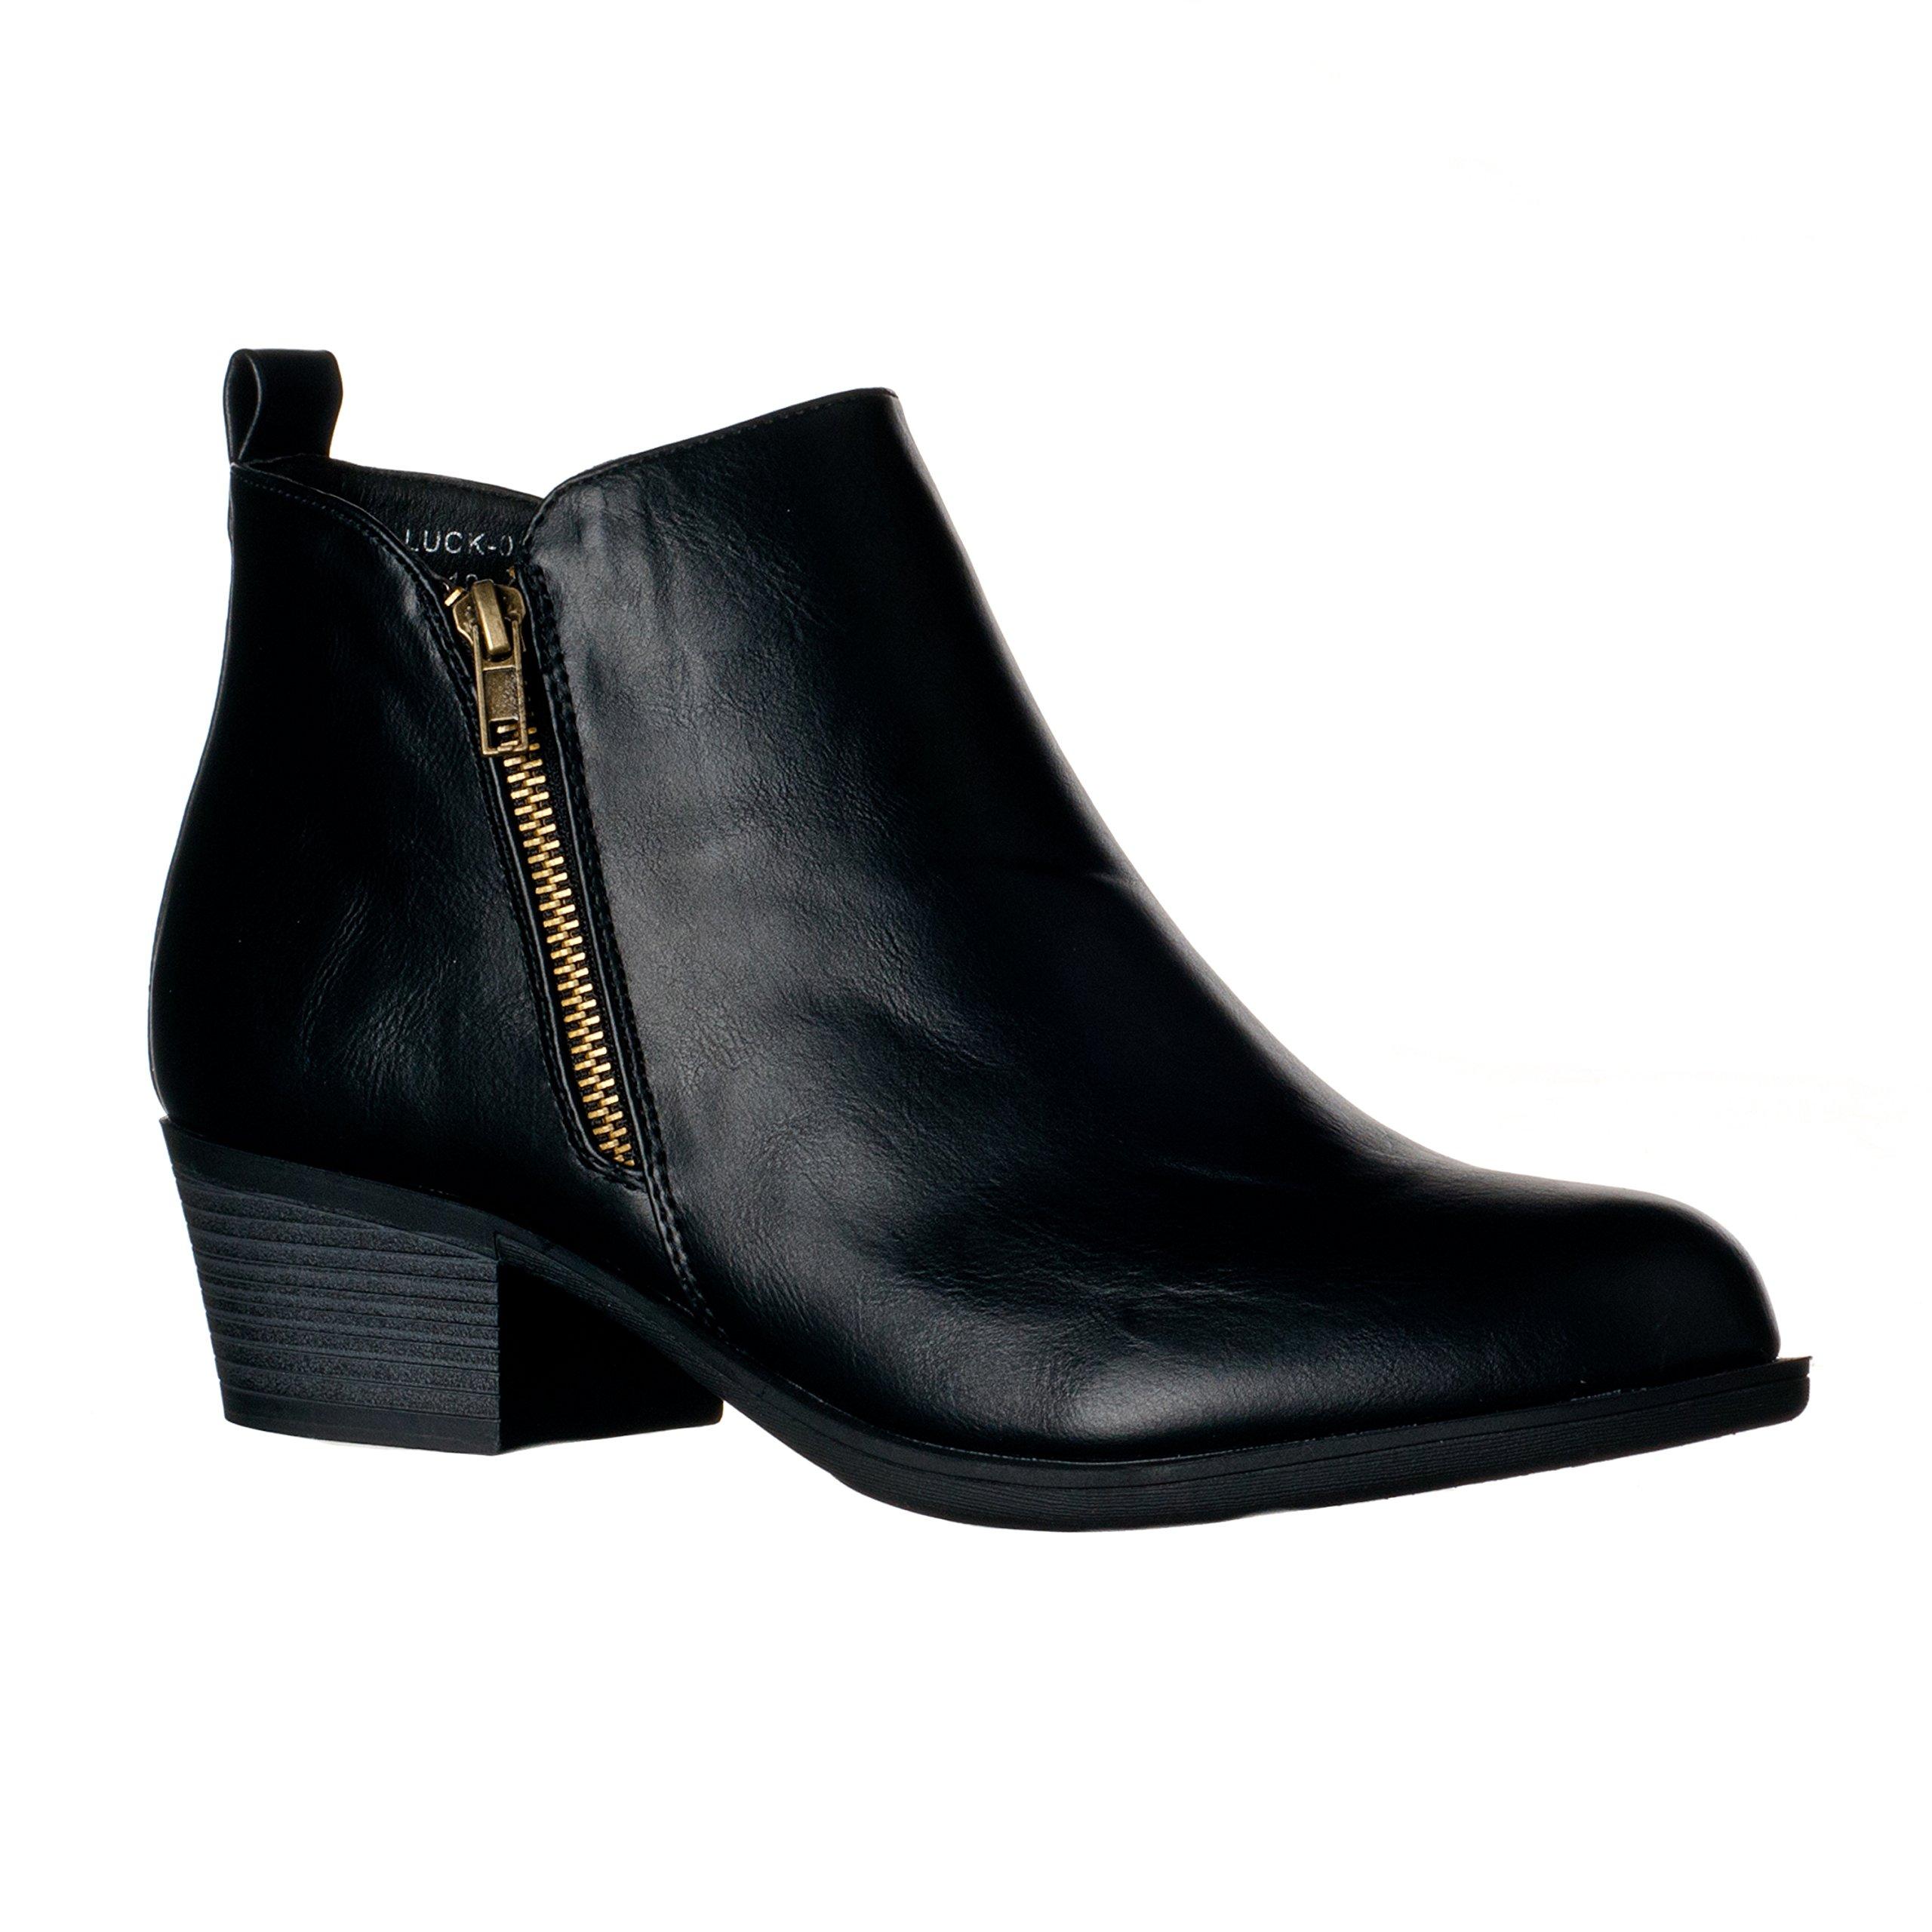 Riverberry Women's Luck Medium Height, Chunky Heel Bootie Boots, Black, 7.5